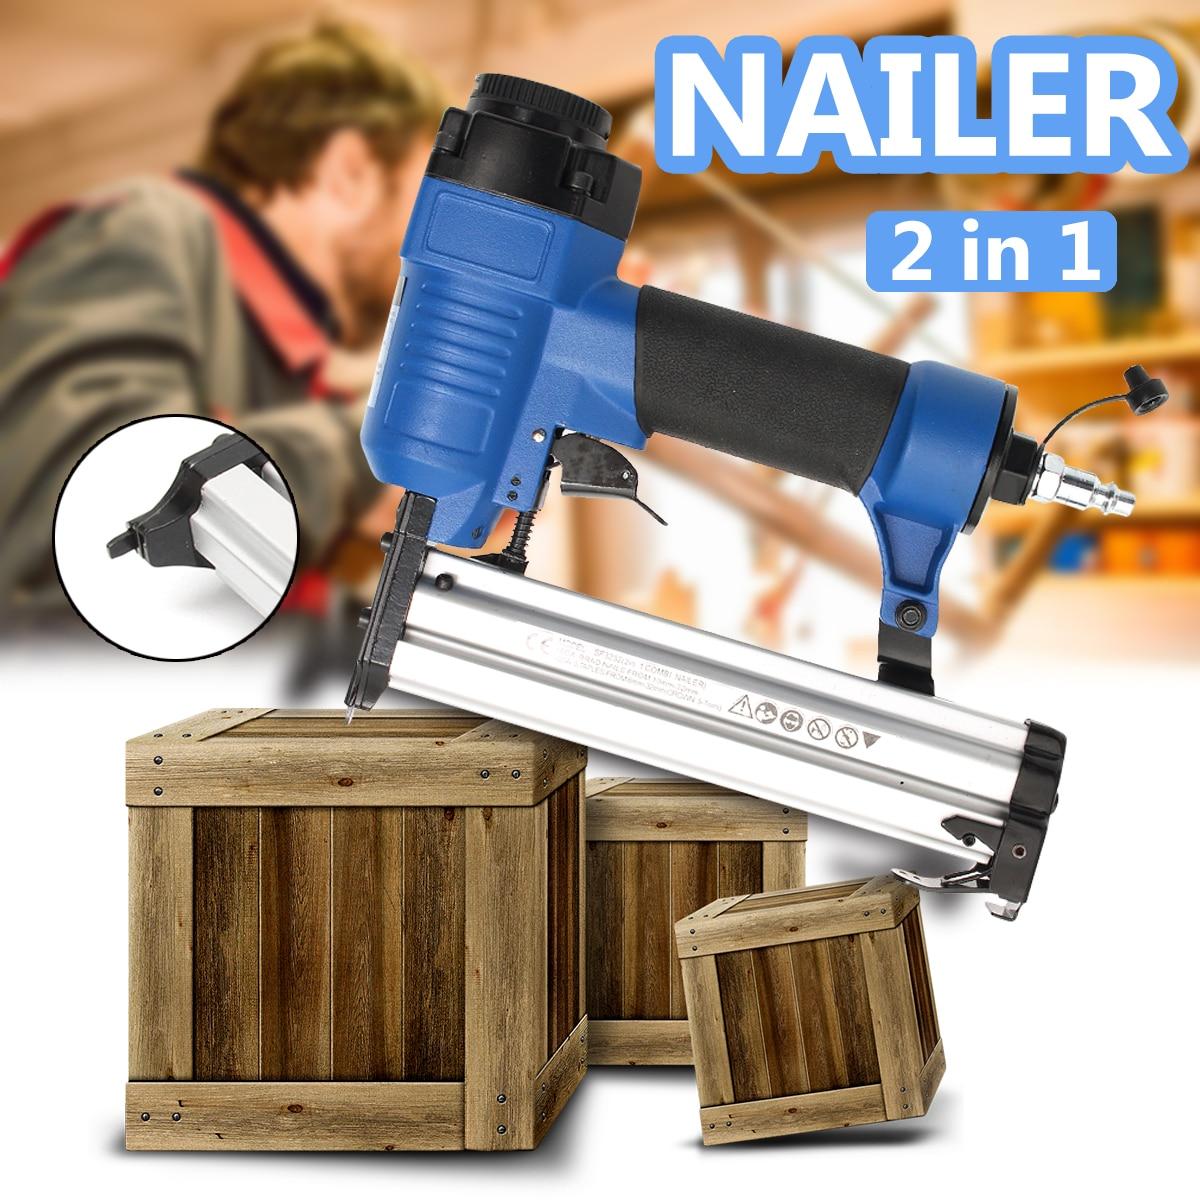 2 In 1 Framing Tacker Nail Stapler Pneumatic Air Staple Nailer Guns 10-32mm Furniture Woodworking Pneumatic Power Tools clipped head framing air nailer chf9034 pneumatic nailer